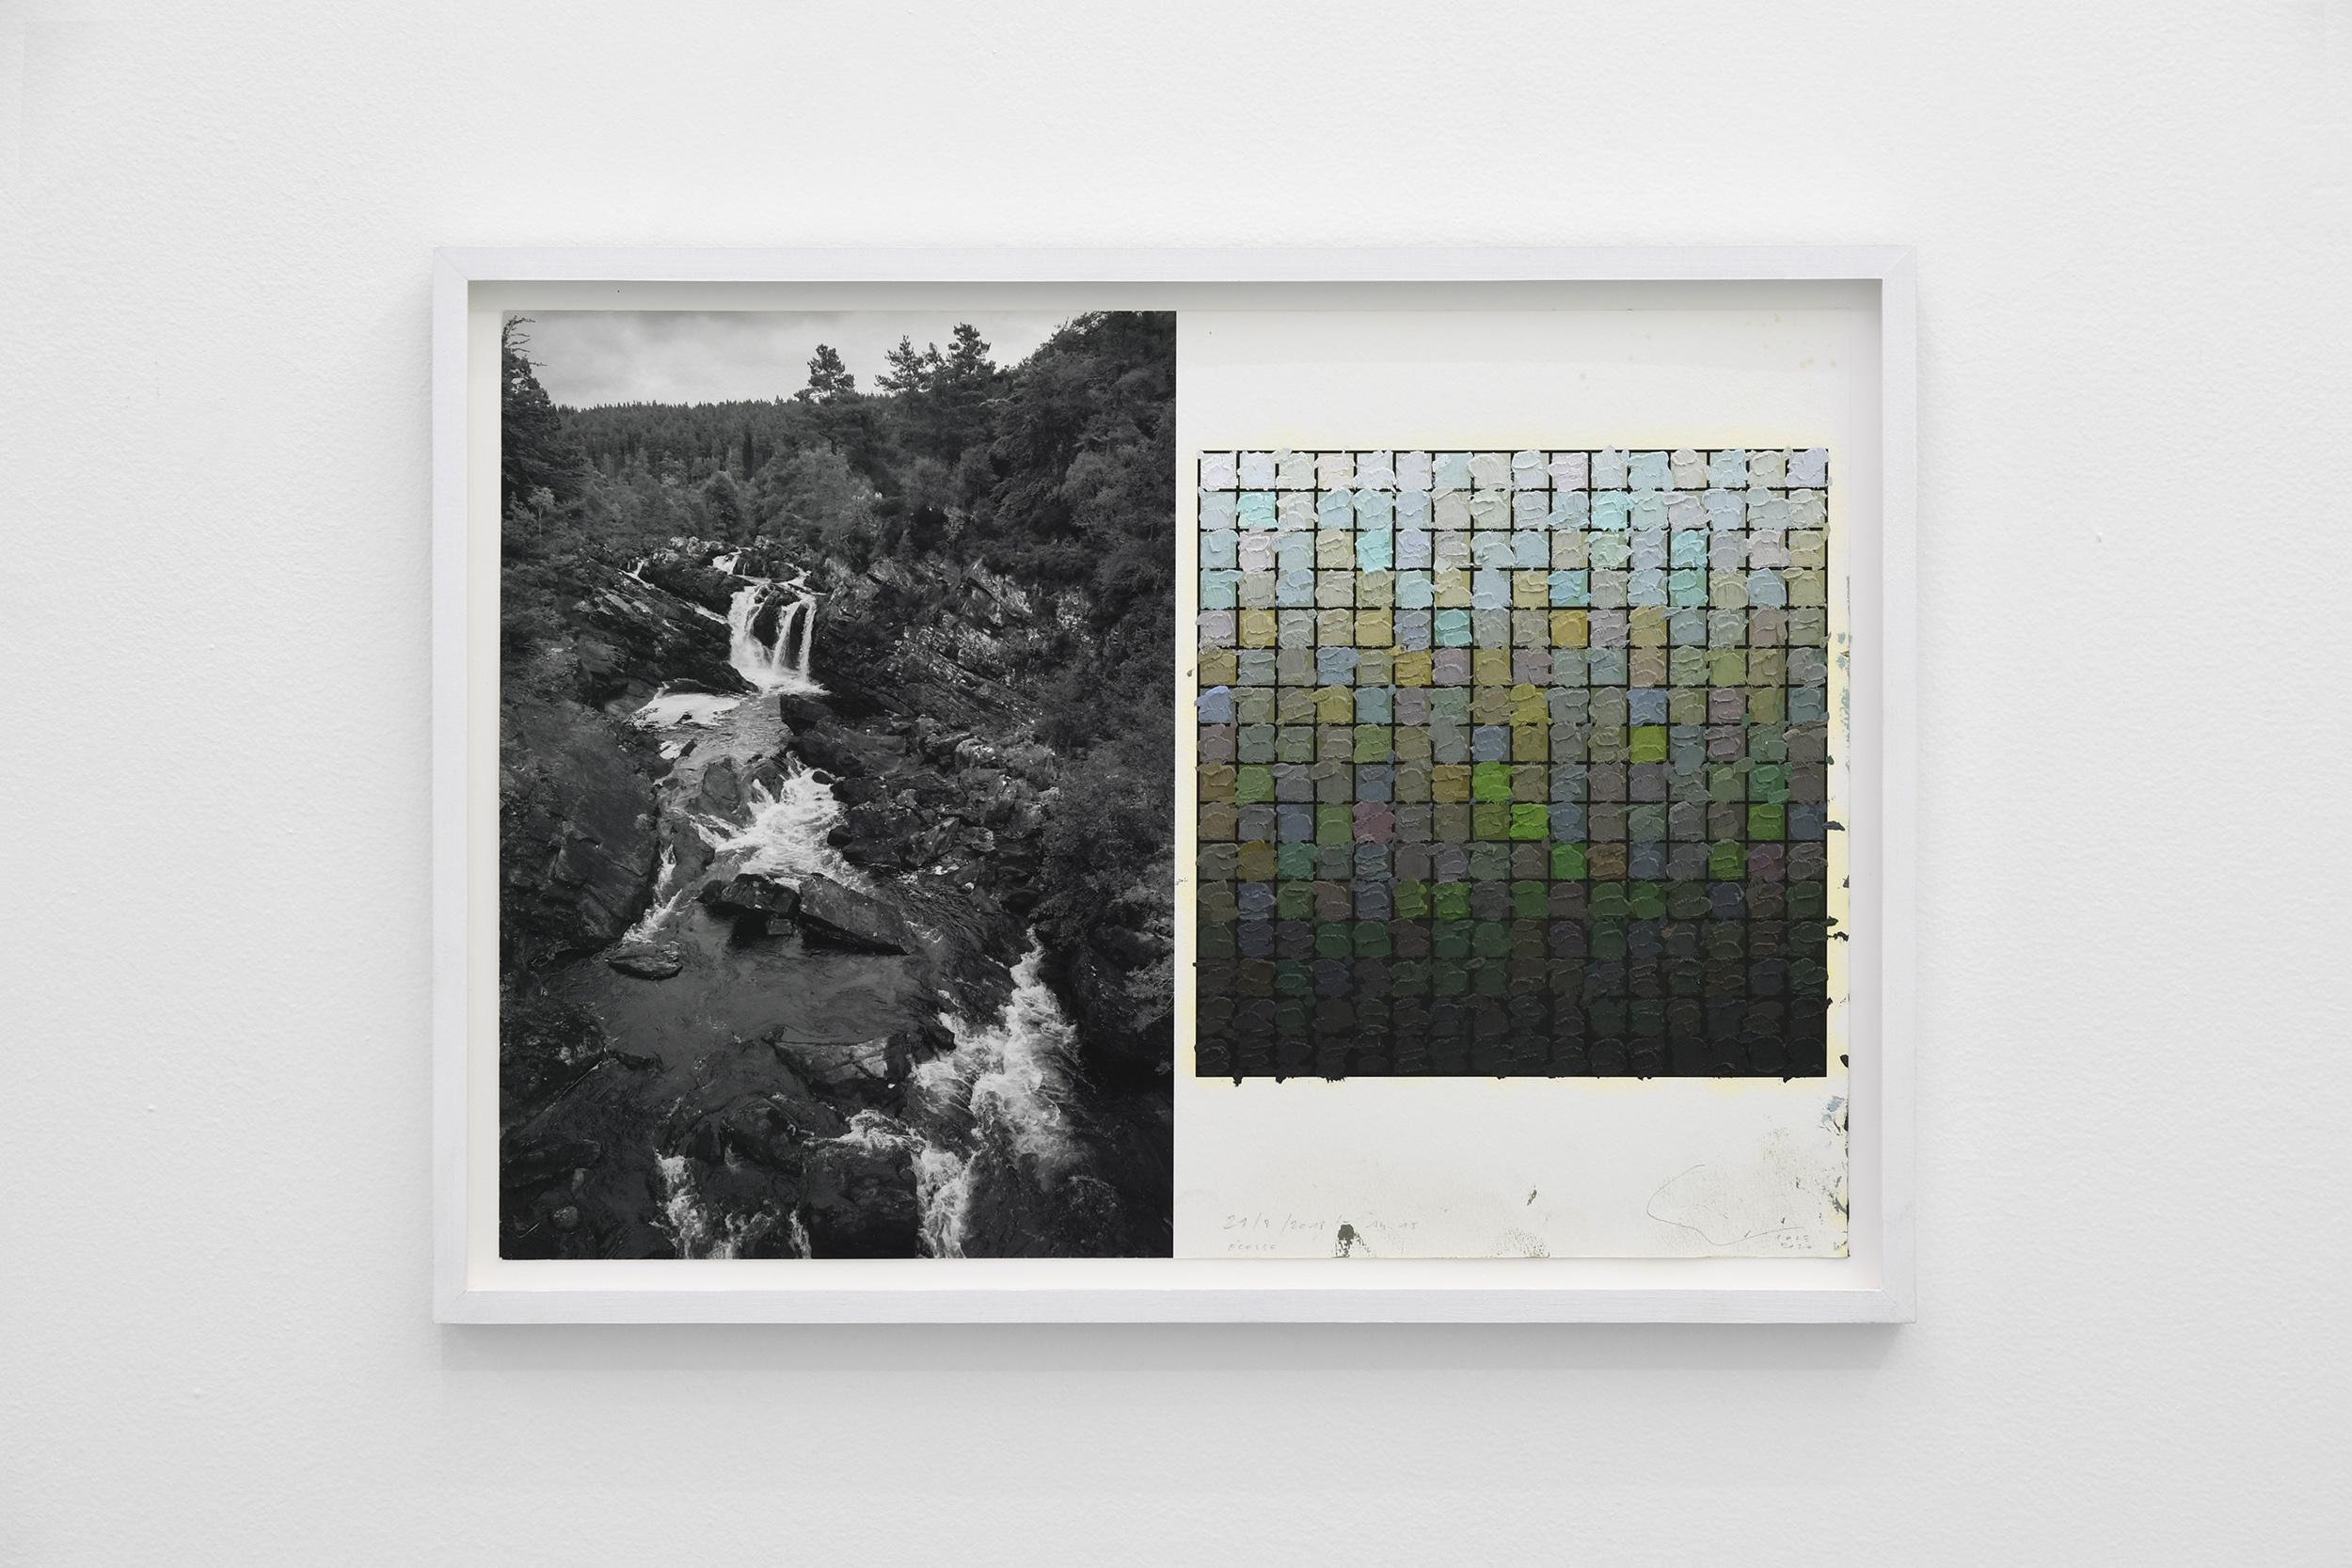 STIJN COLE, Souvenir - Ecosse 21_08_2018 14h15, 2018, Oil on inkjetprint, 33,2 x 45,8 cm (framed)